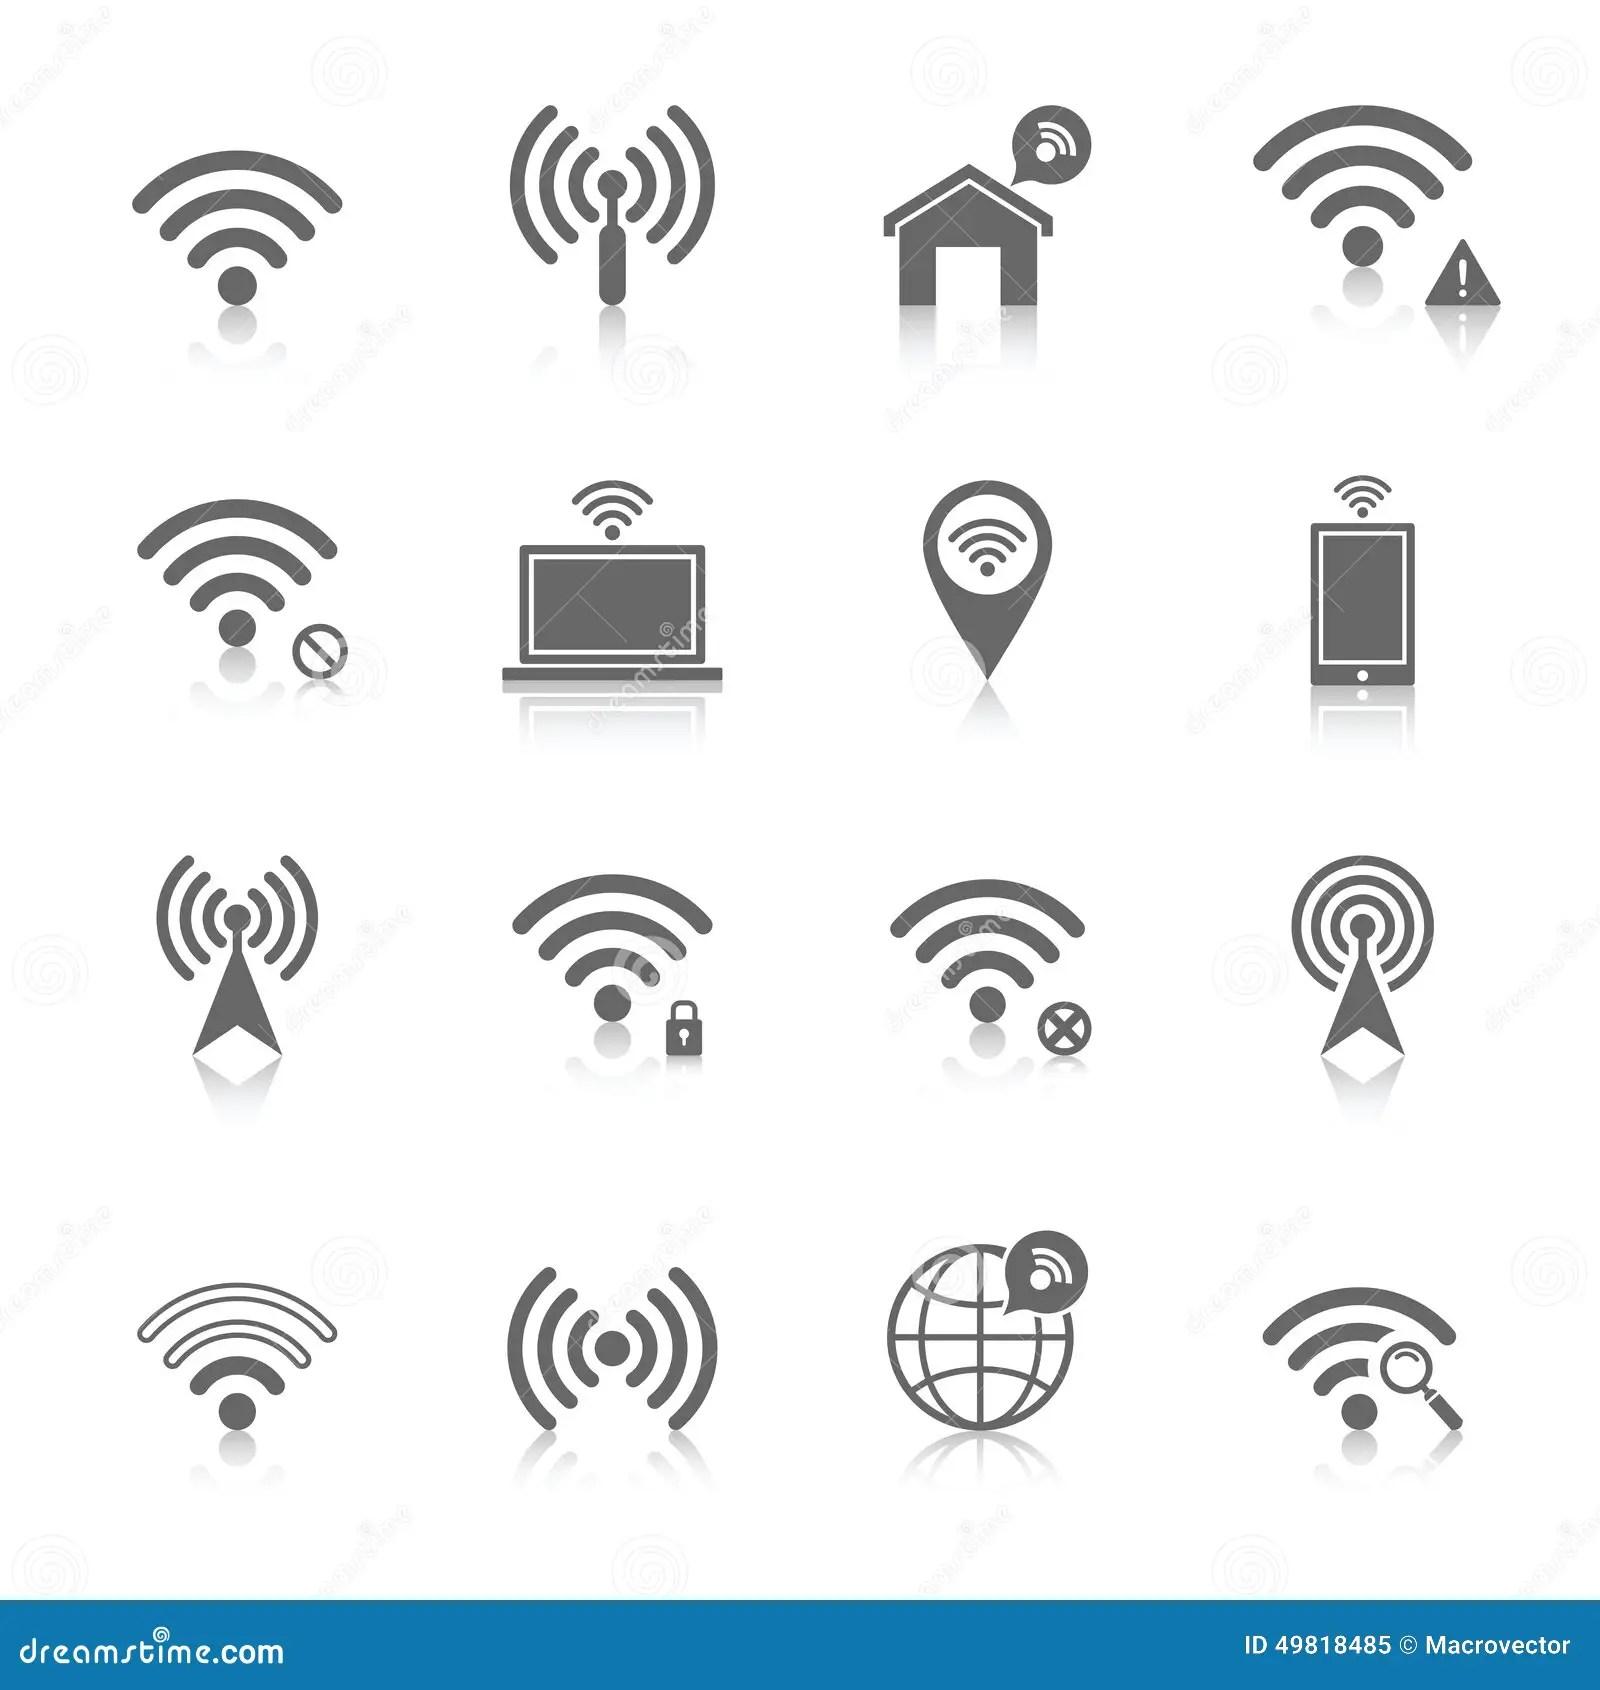 wireless signal monitor